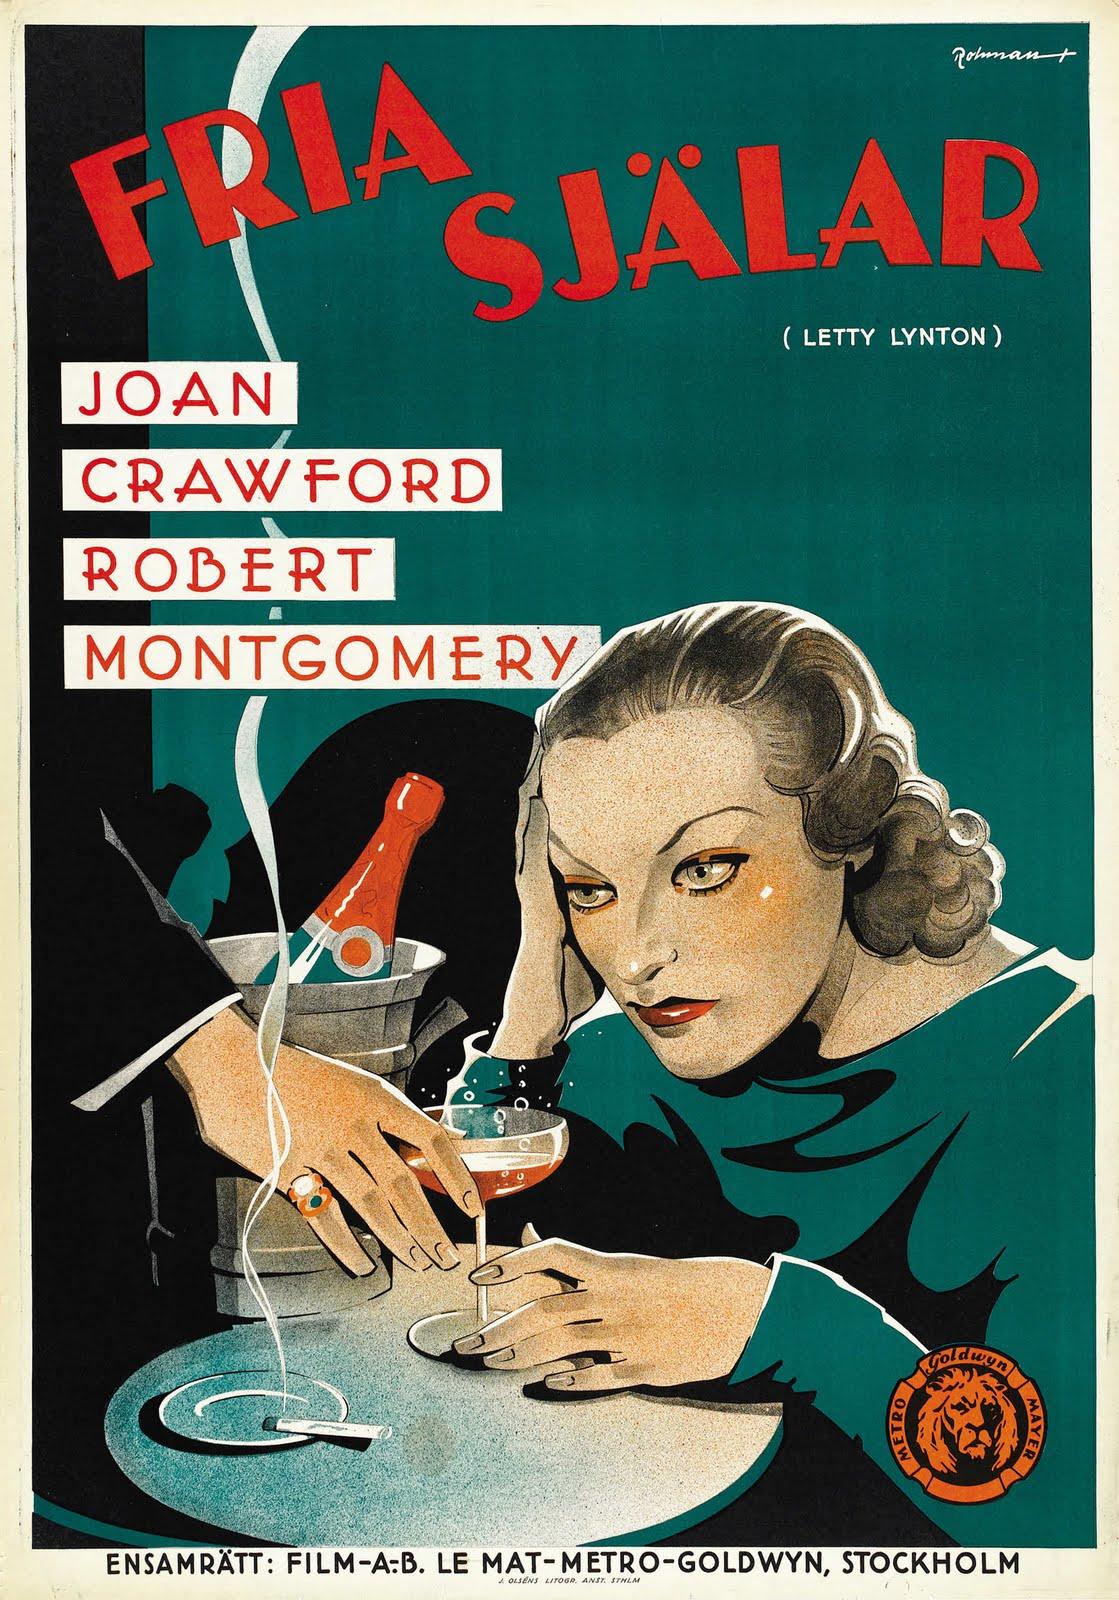 Letty Lynton 1932